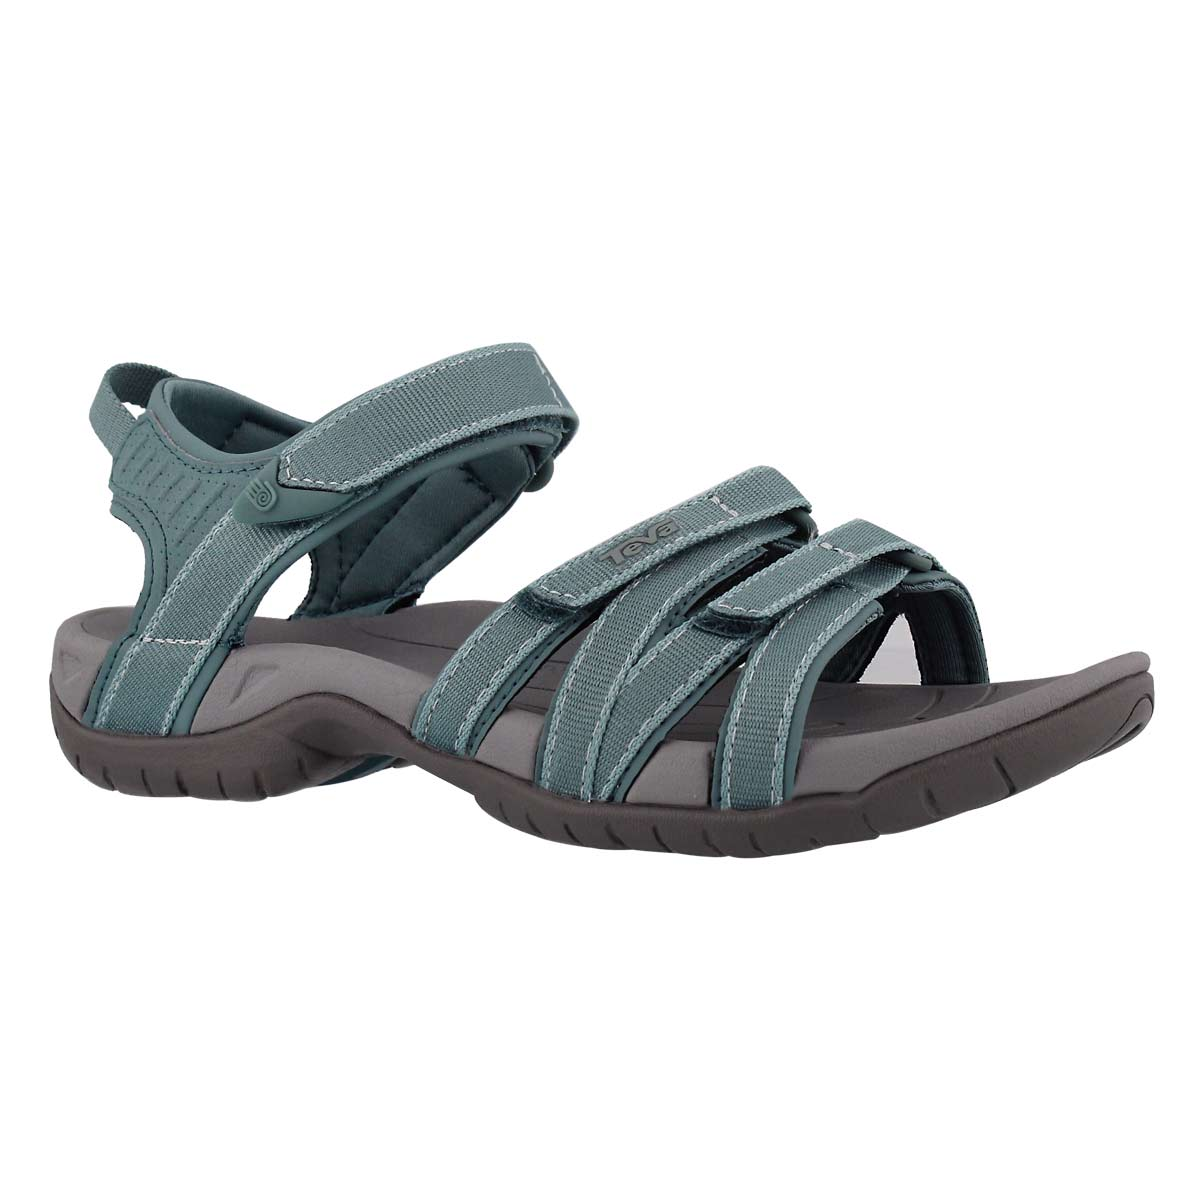 Women's TIRRA north alantic sport sandals